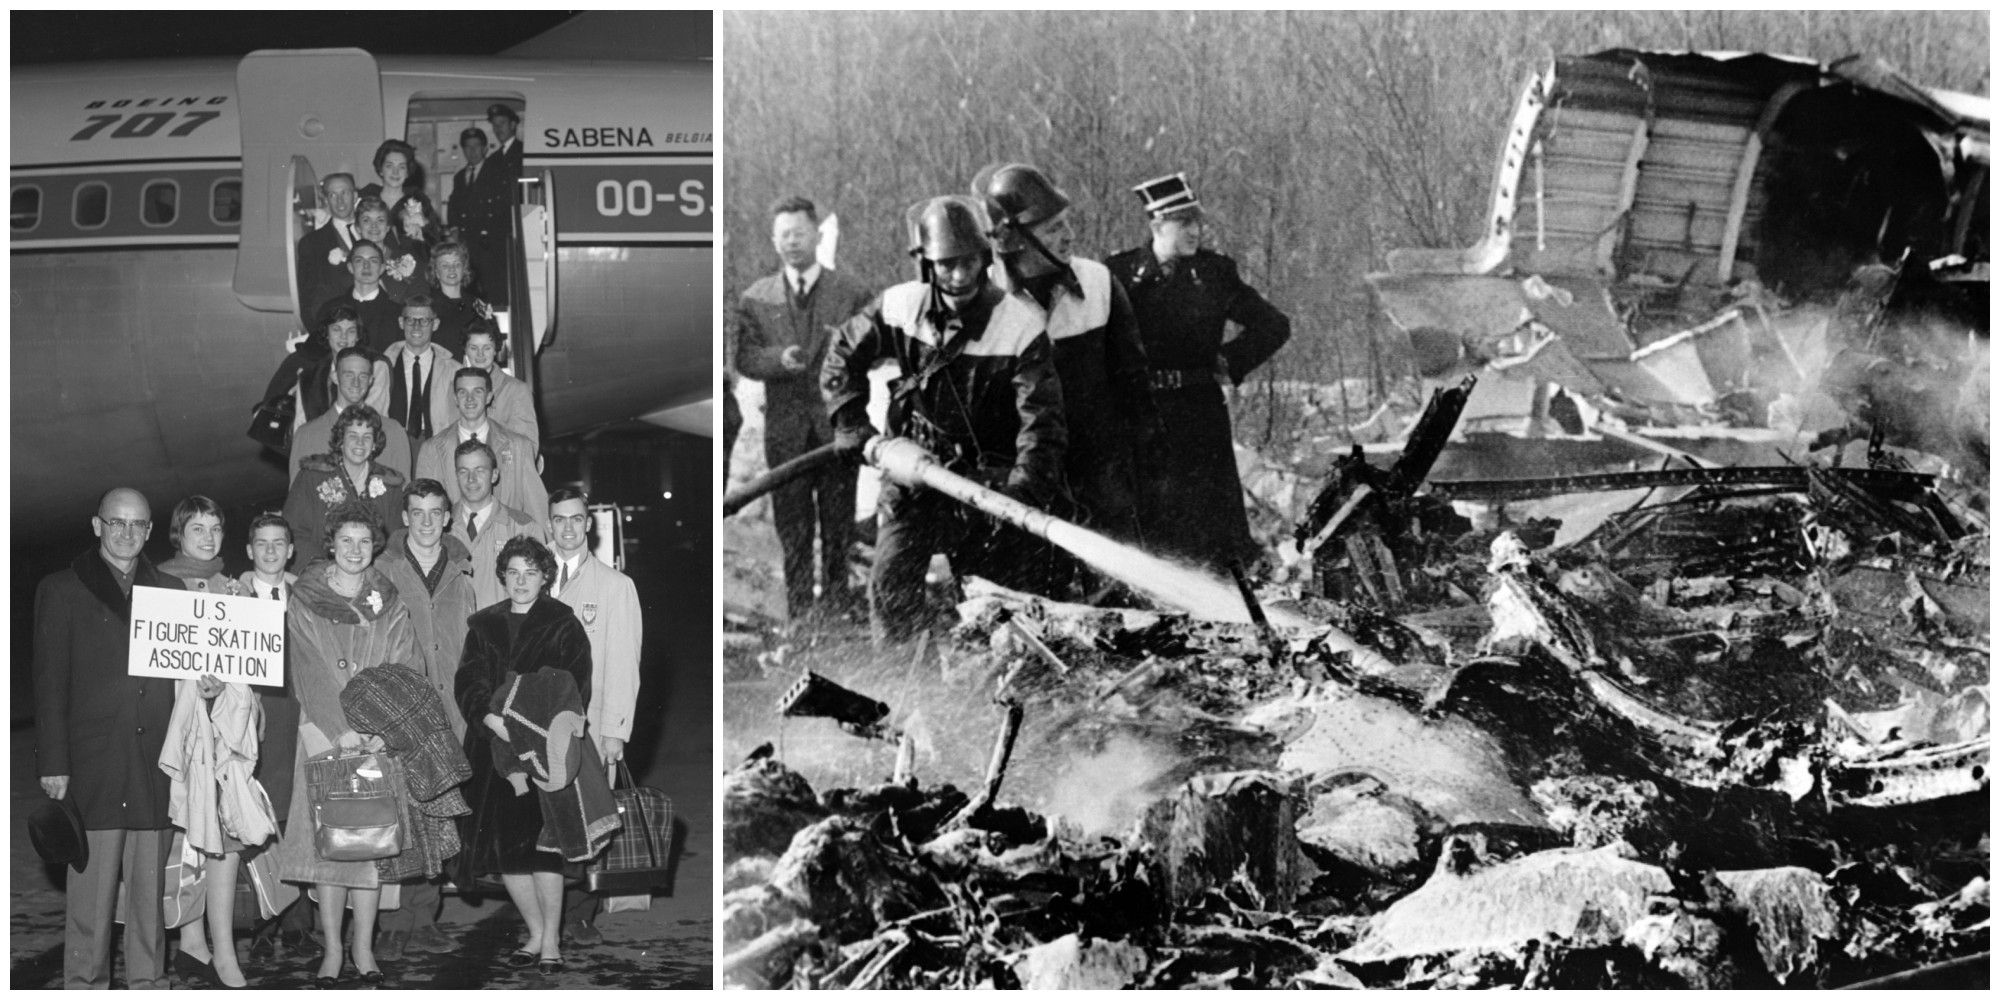 The Horrific 1961 Plane Crash That Devastated—and Reshaped—U.S. Figure  Skating